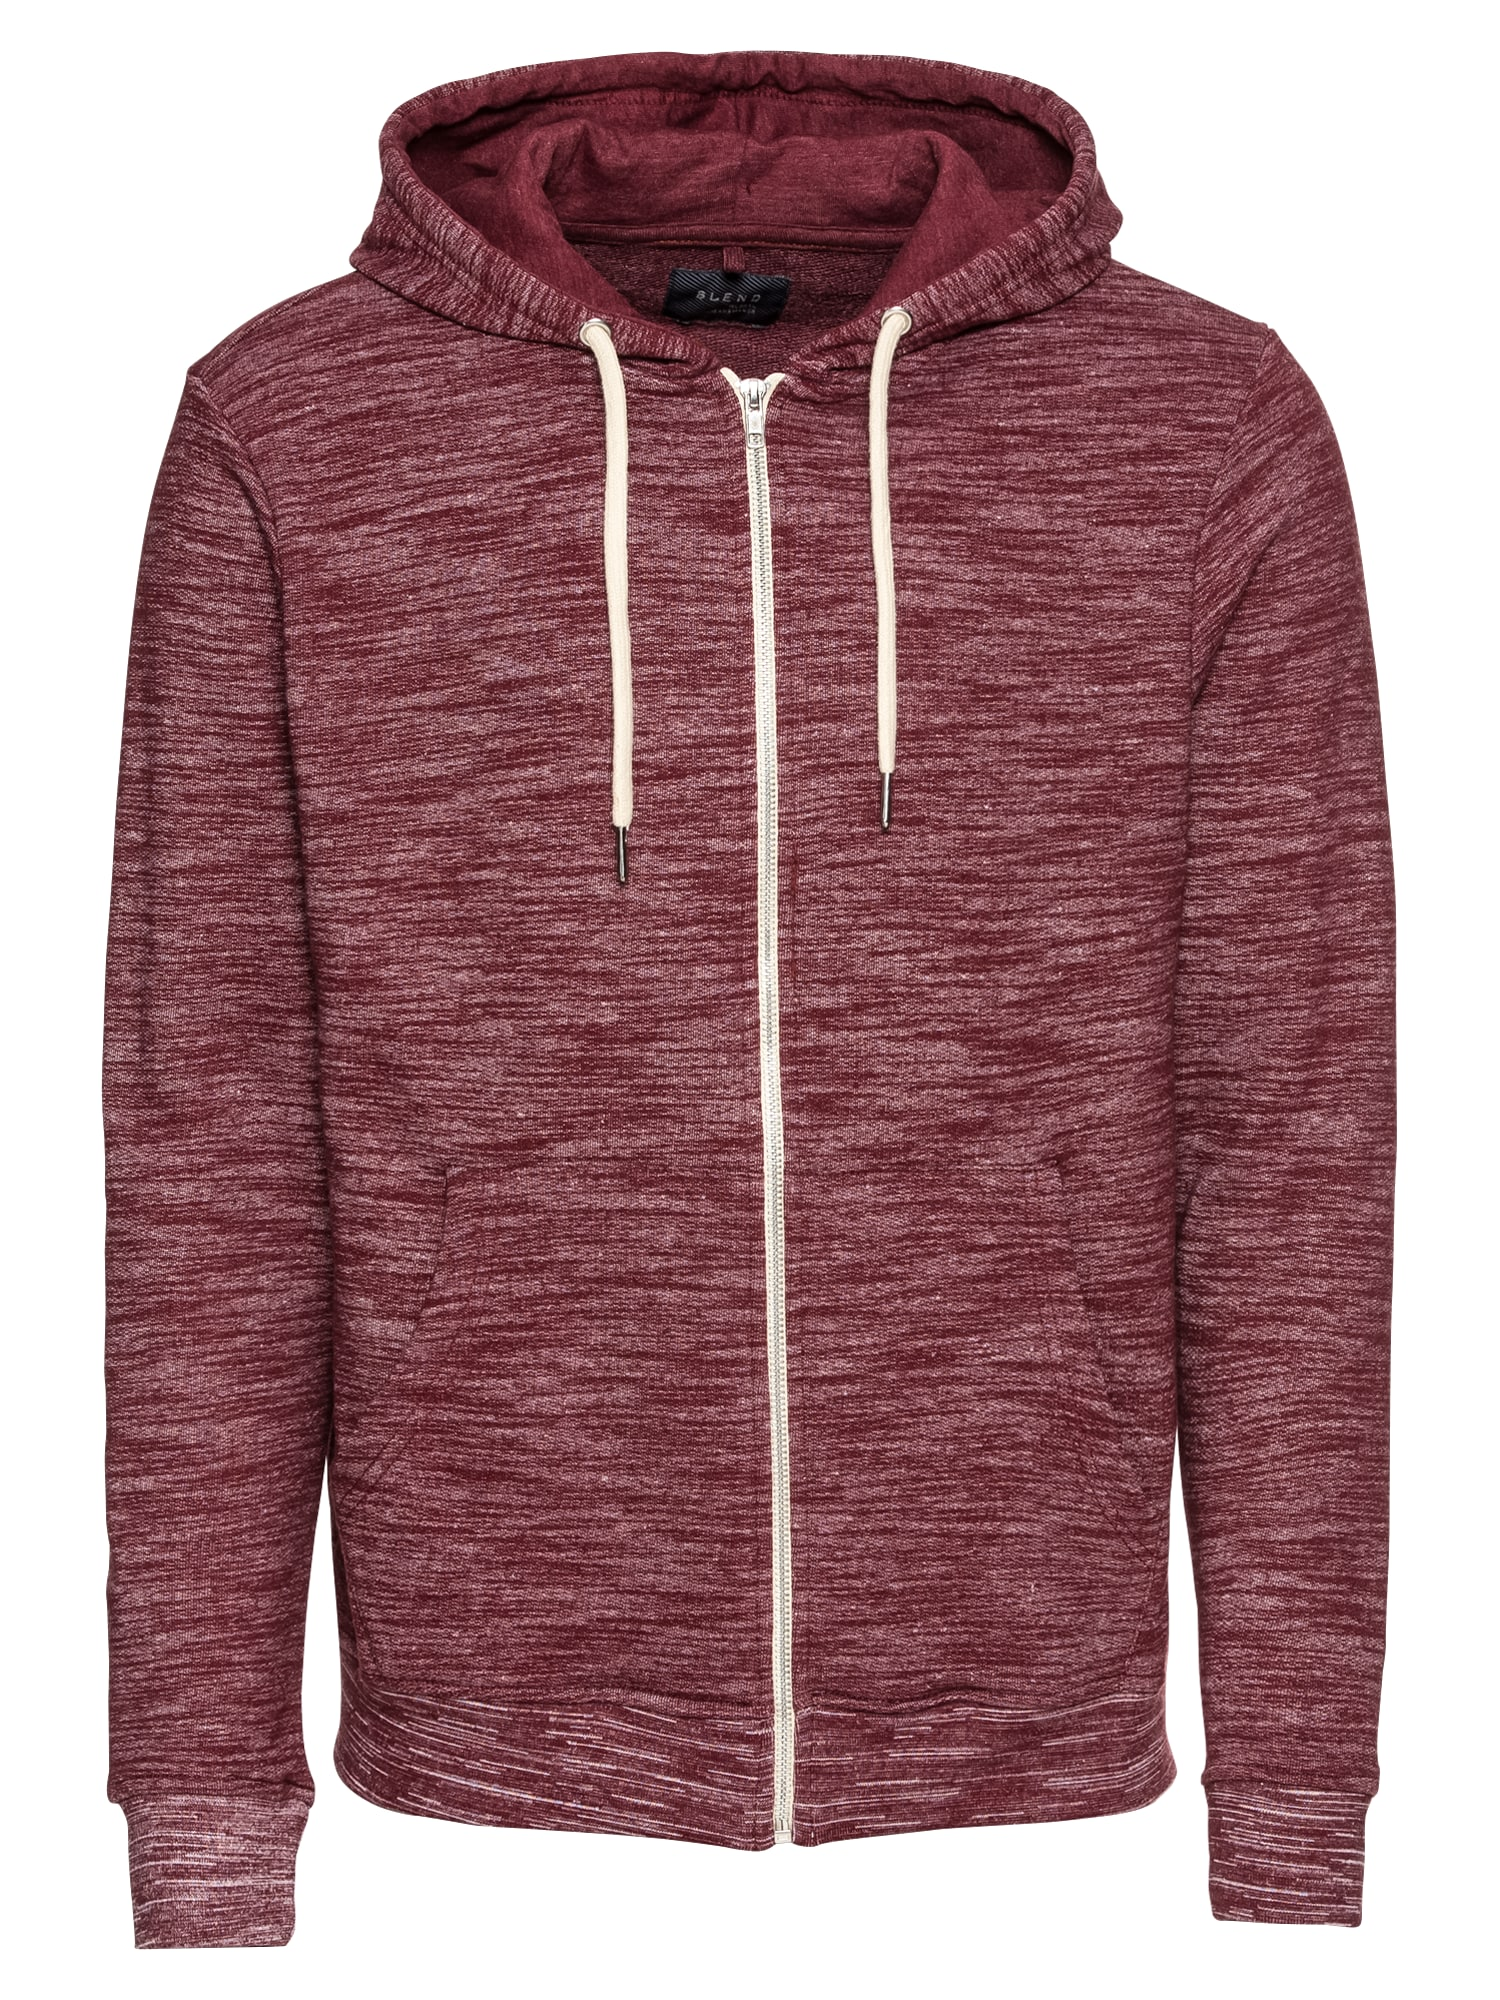 Mikina s kapucí Sweatshirt - NOOS Meliert bordó BLEND